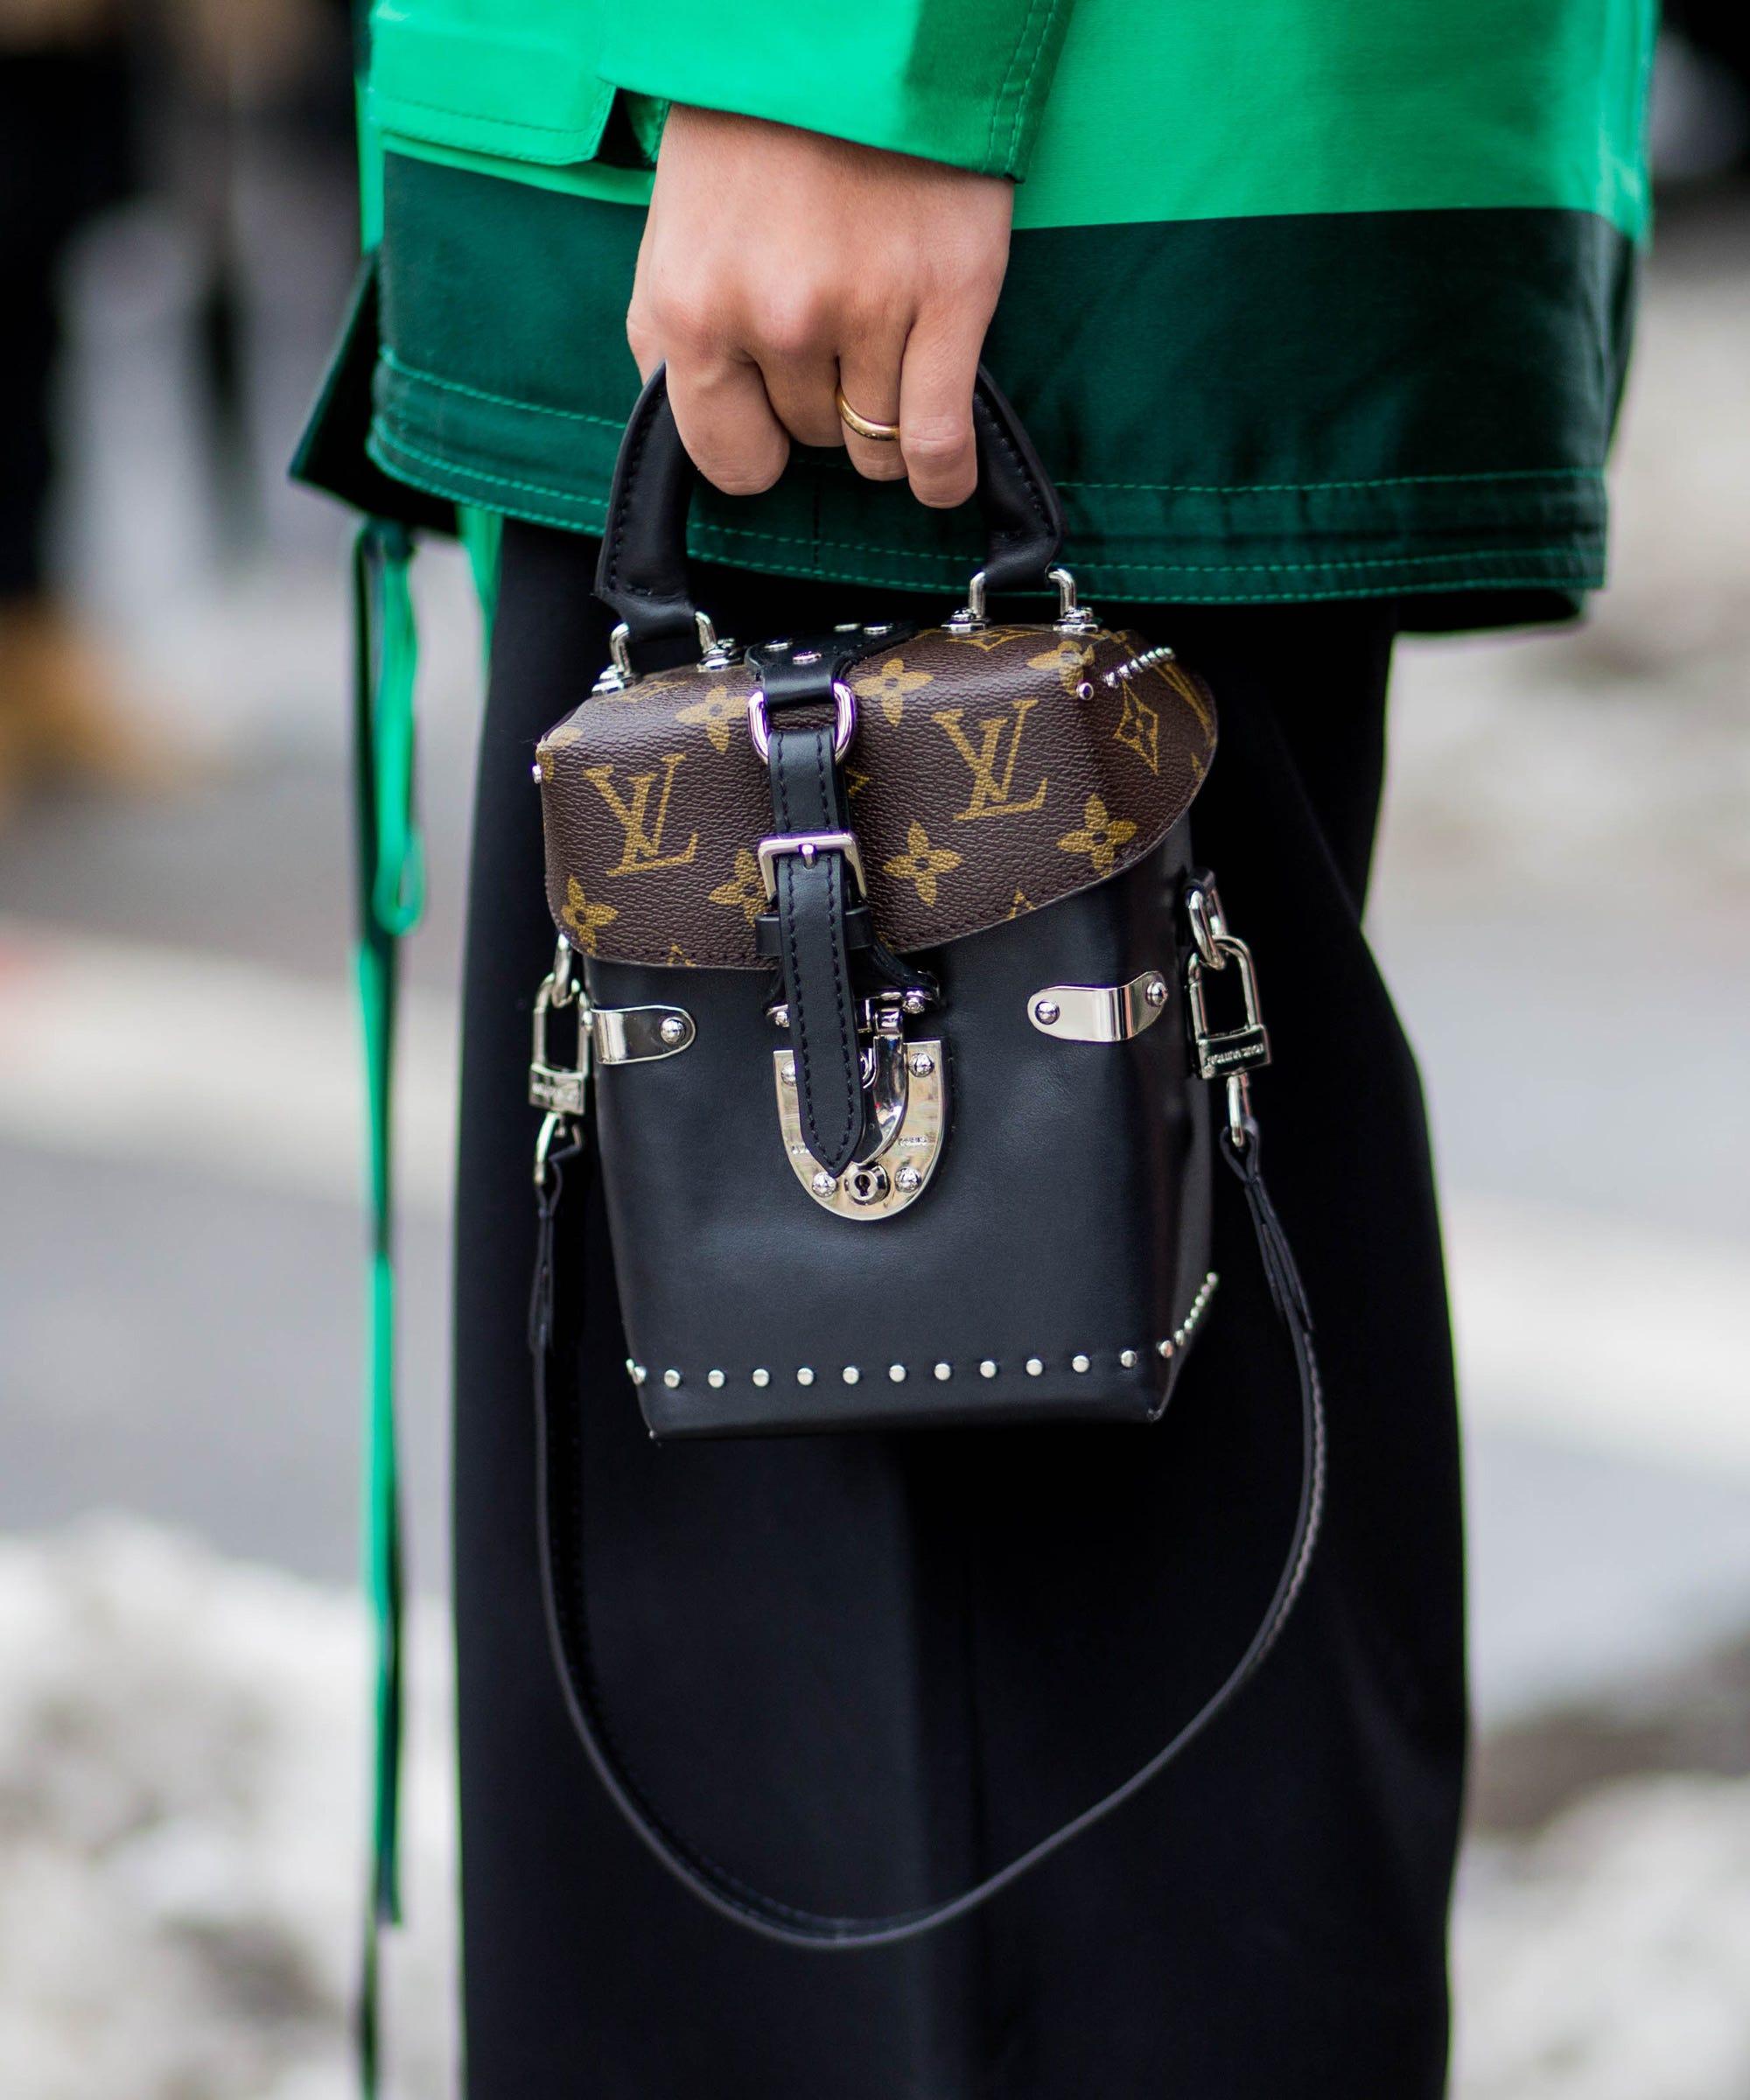 Louis vuitton logo handbag trend street style accessory for Louis vuitton bin bags